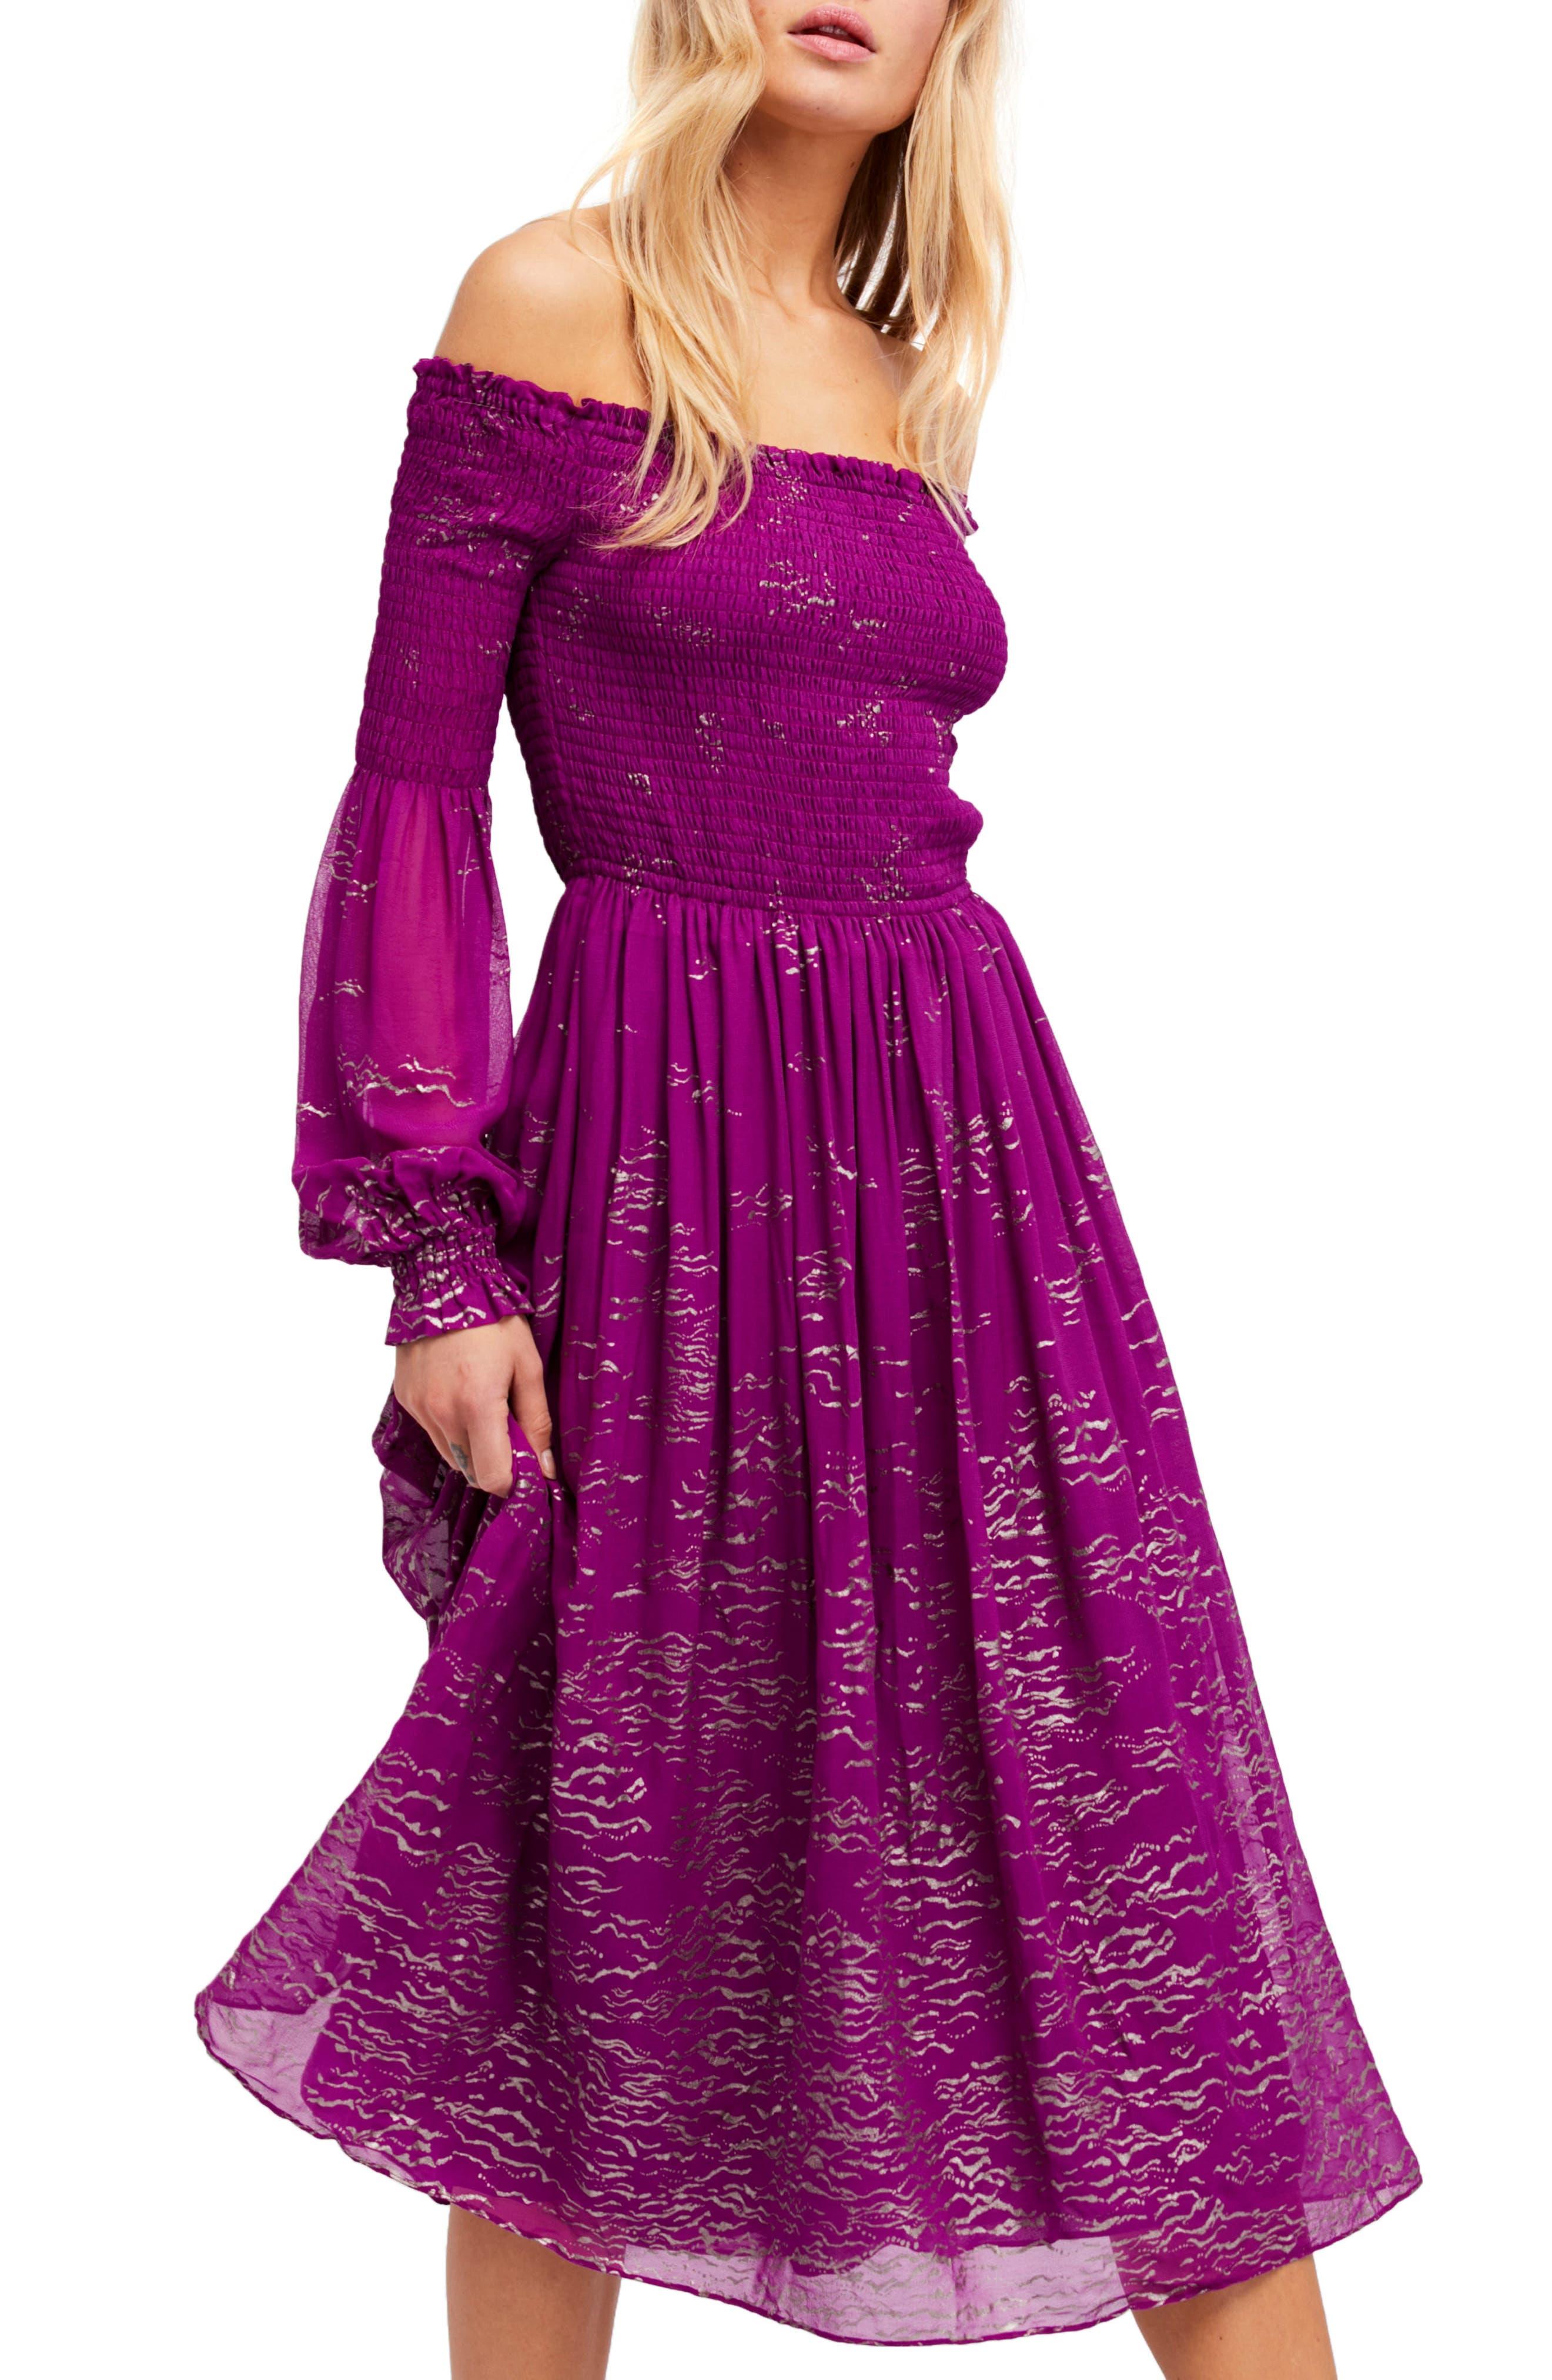 Foiled Smocked Midi Dress,                             Alternate thumbnail 10, color,